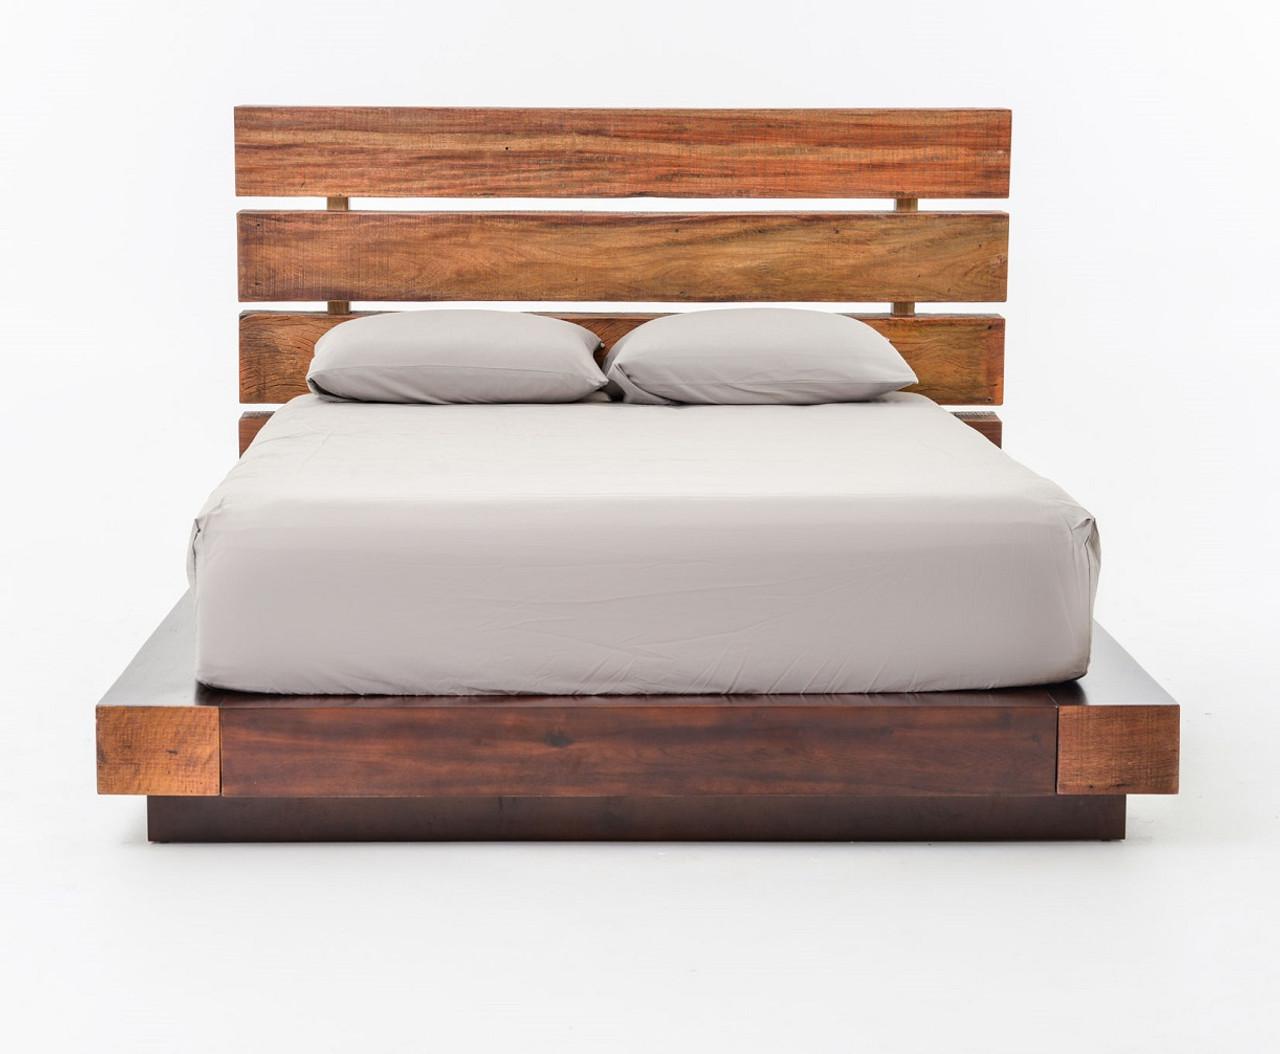 Deluxe Headboard King Platform Bed Iggy King Platform Bed Frame Bina Iggy King Platform Bed Reclaimed Wood Platform Bed Frame King Platform Bed Frame houzz-03 King Platform Bed